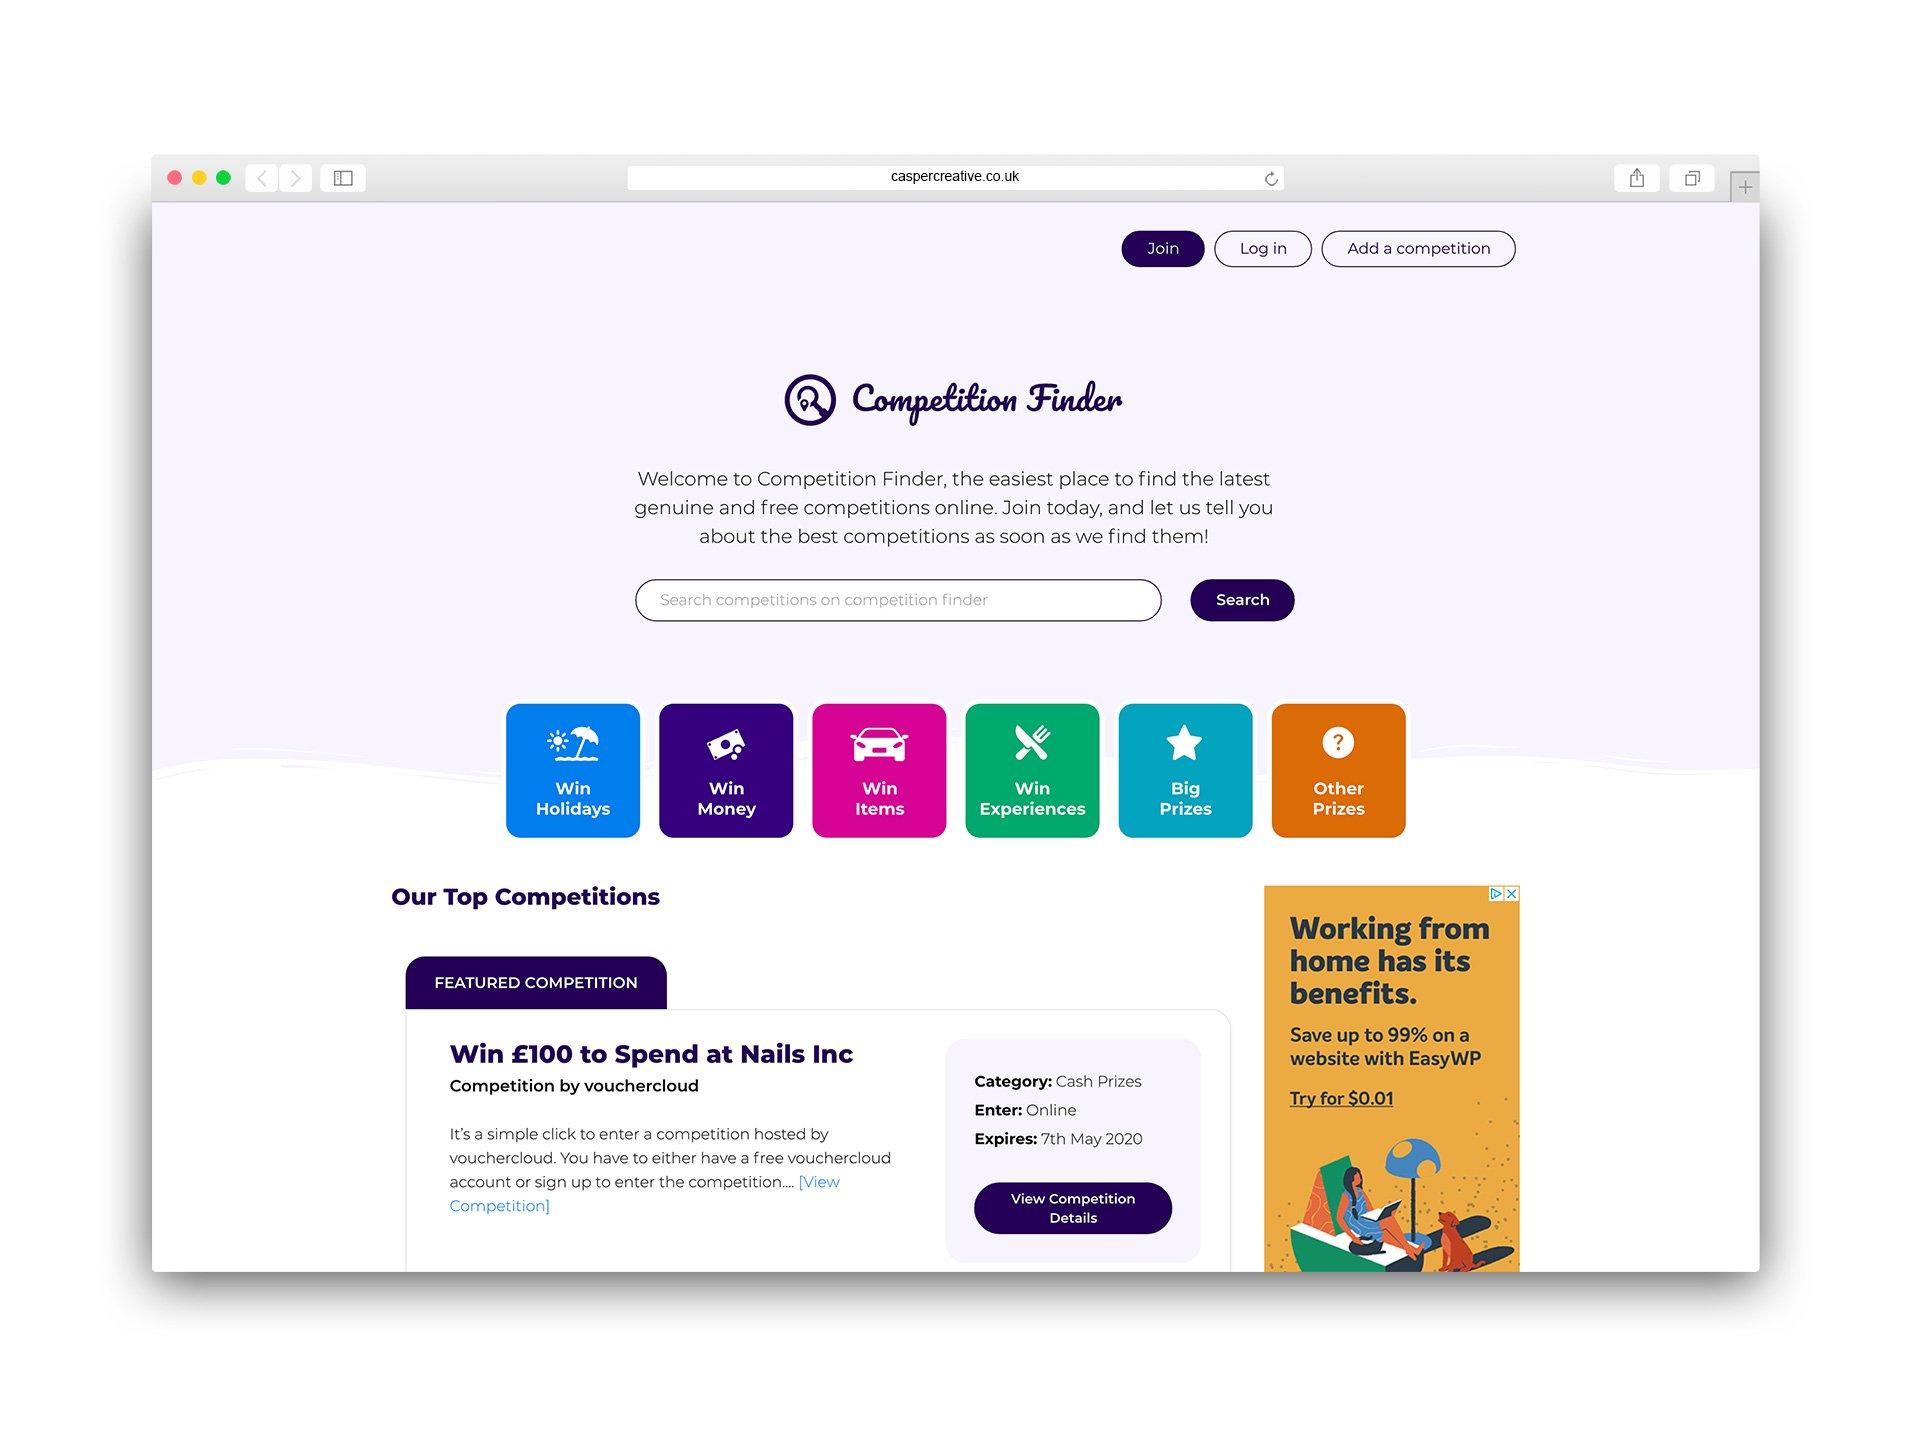 Competition Finder - competition-finder.co.uk